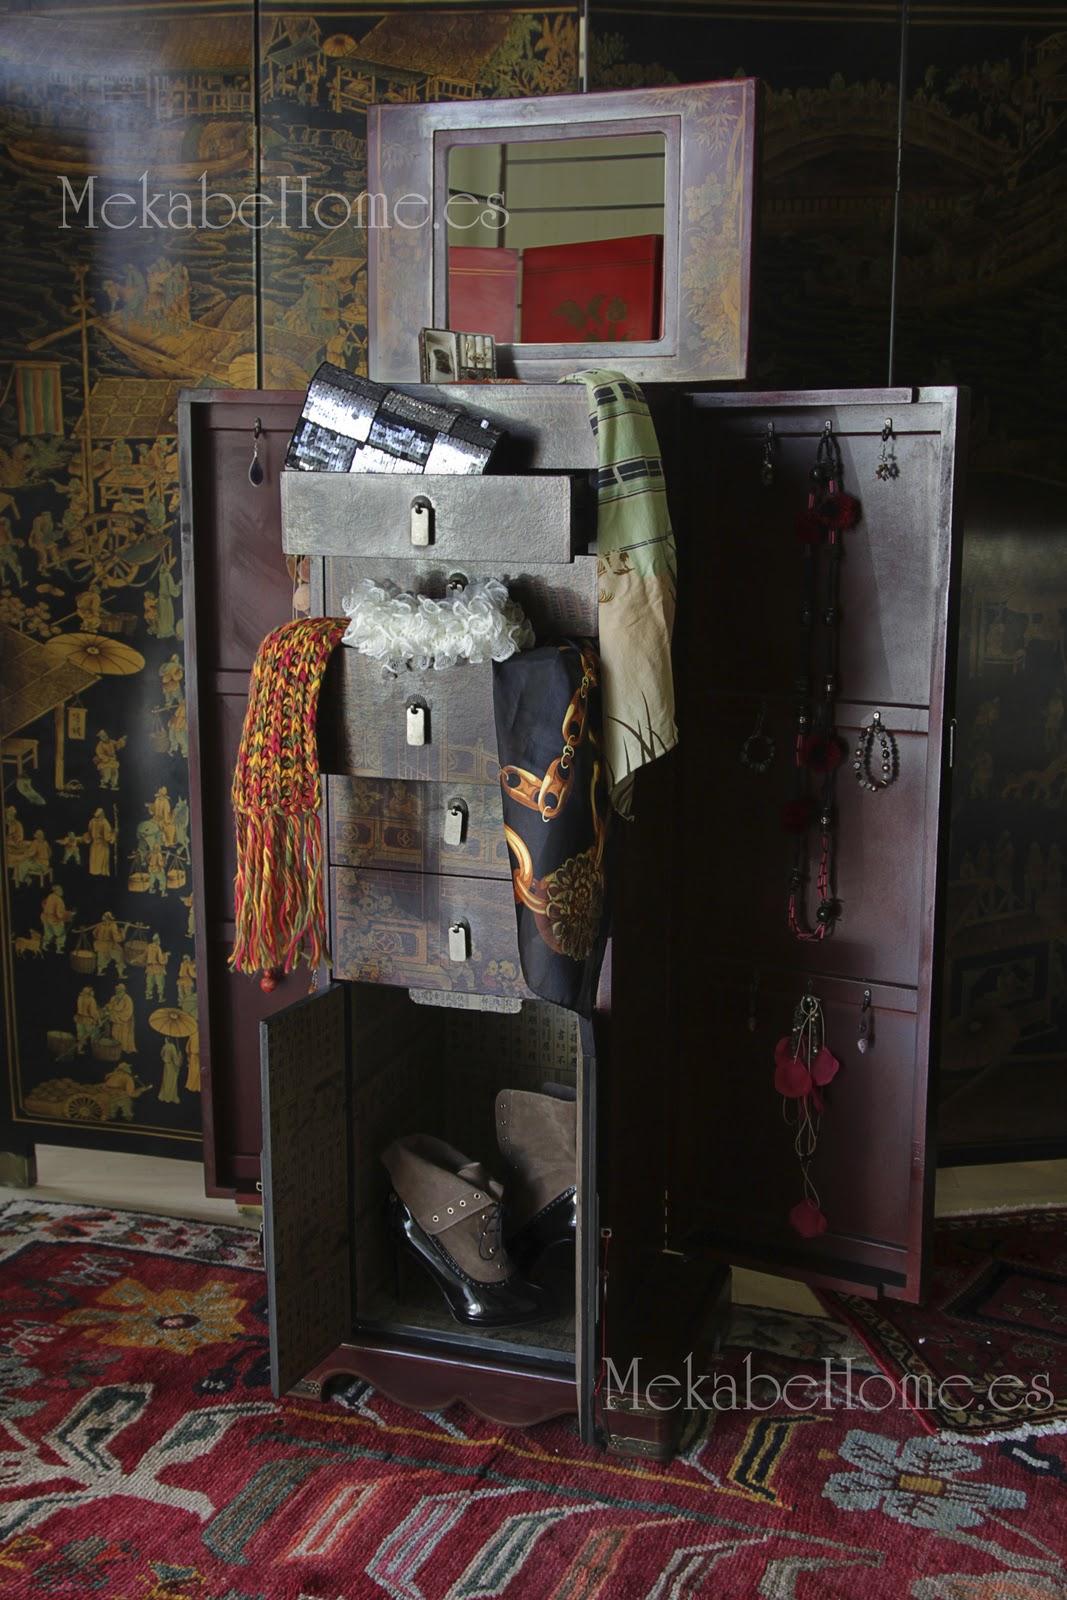 Muebles chinos en piel decorada mekabe home for Muebles chinos barcelona